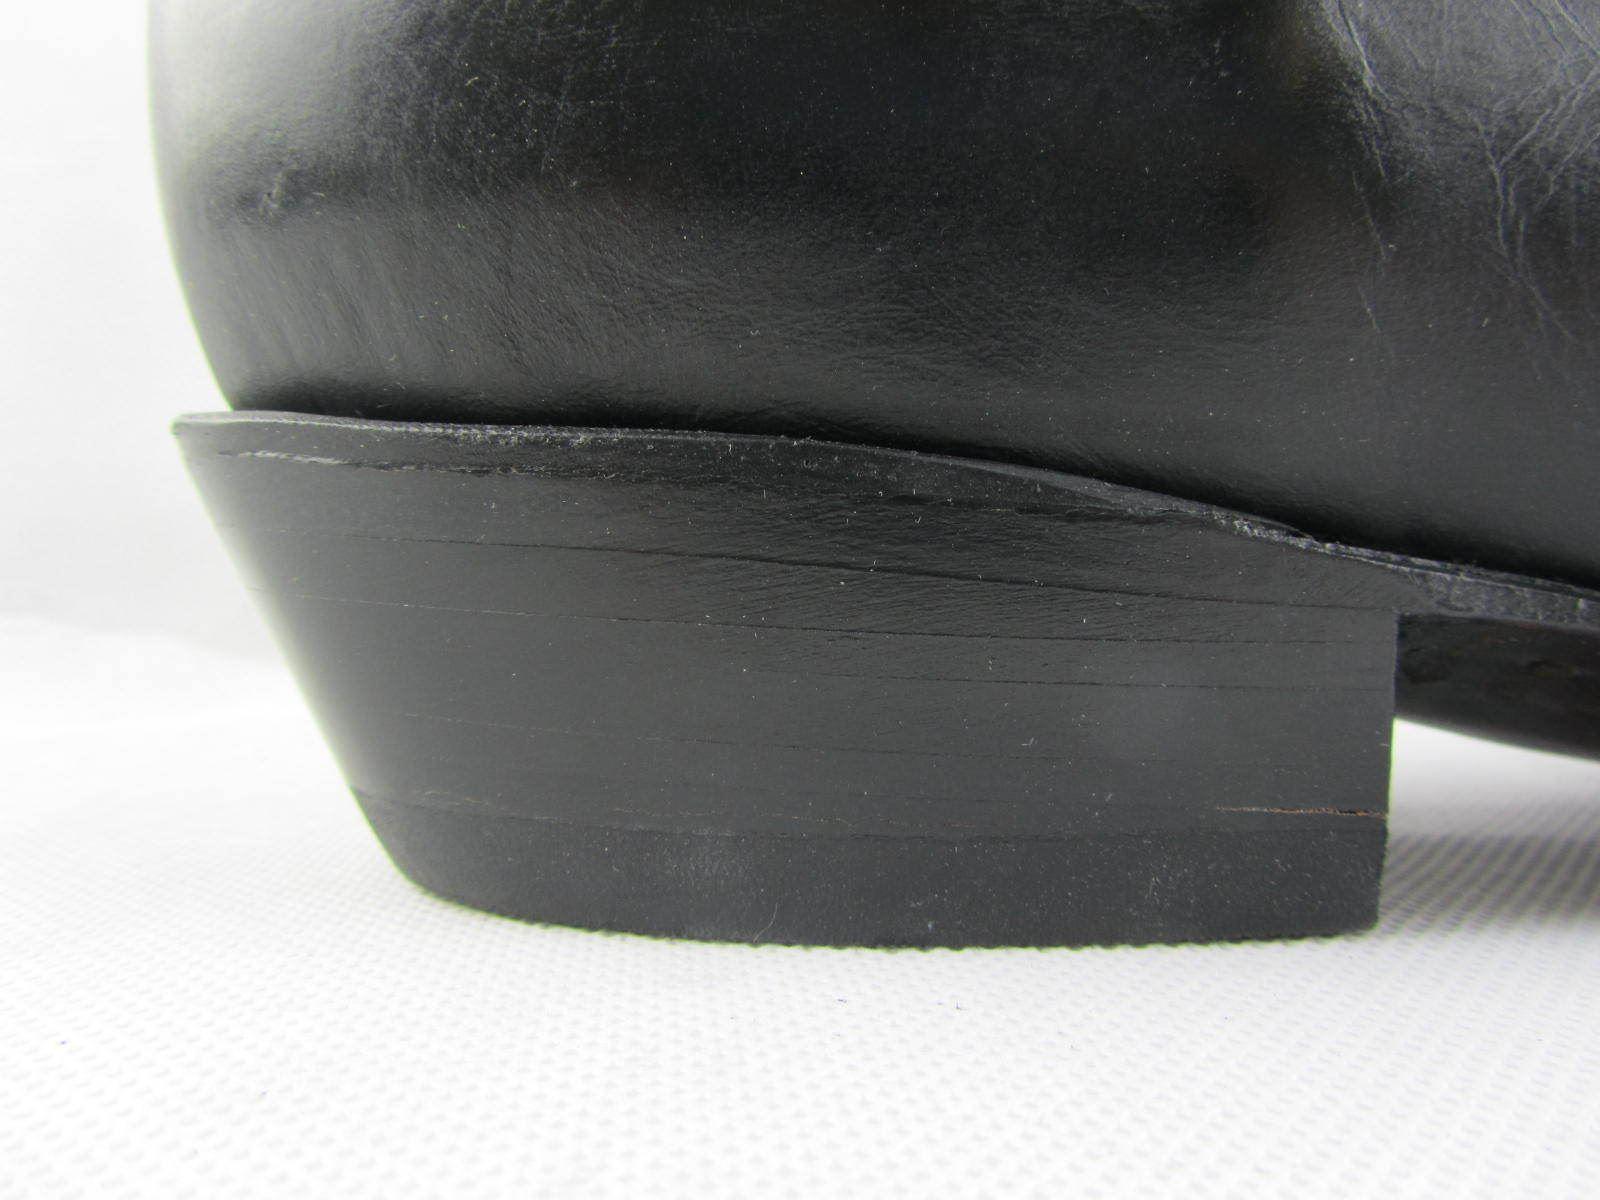 les bottes en cuir moto radical co harnais harnais harnais bottes | Spécial Acheter  fe6da2